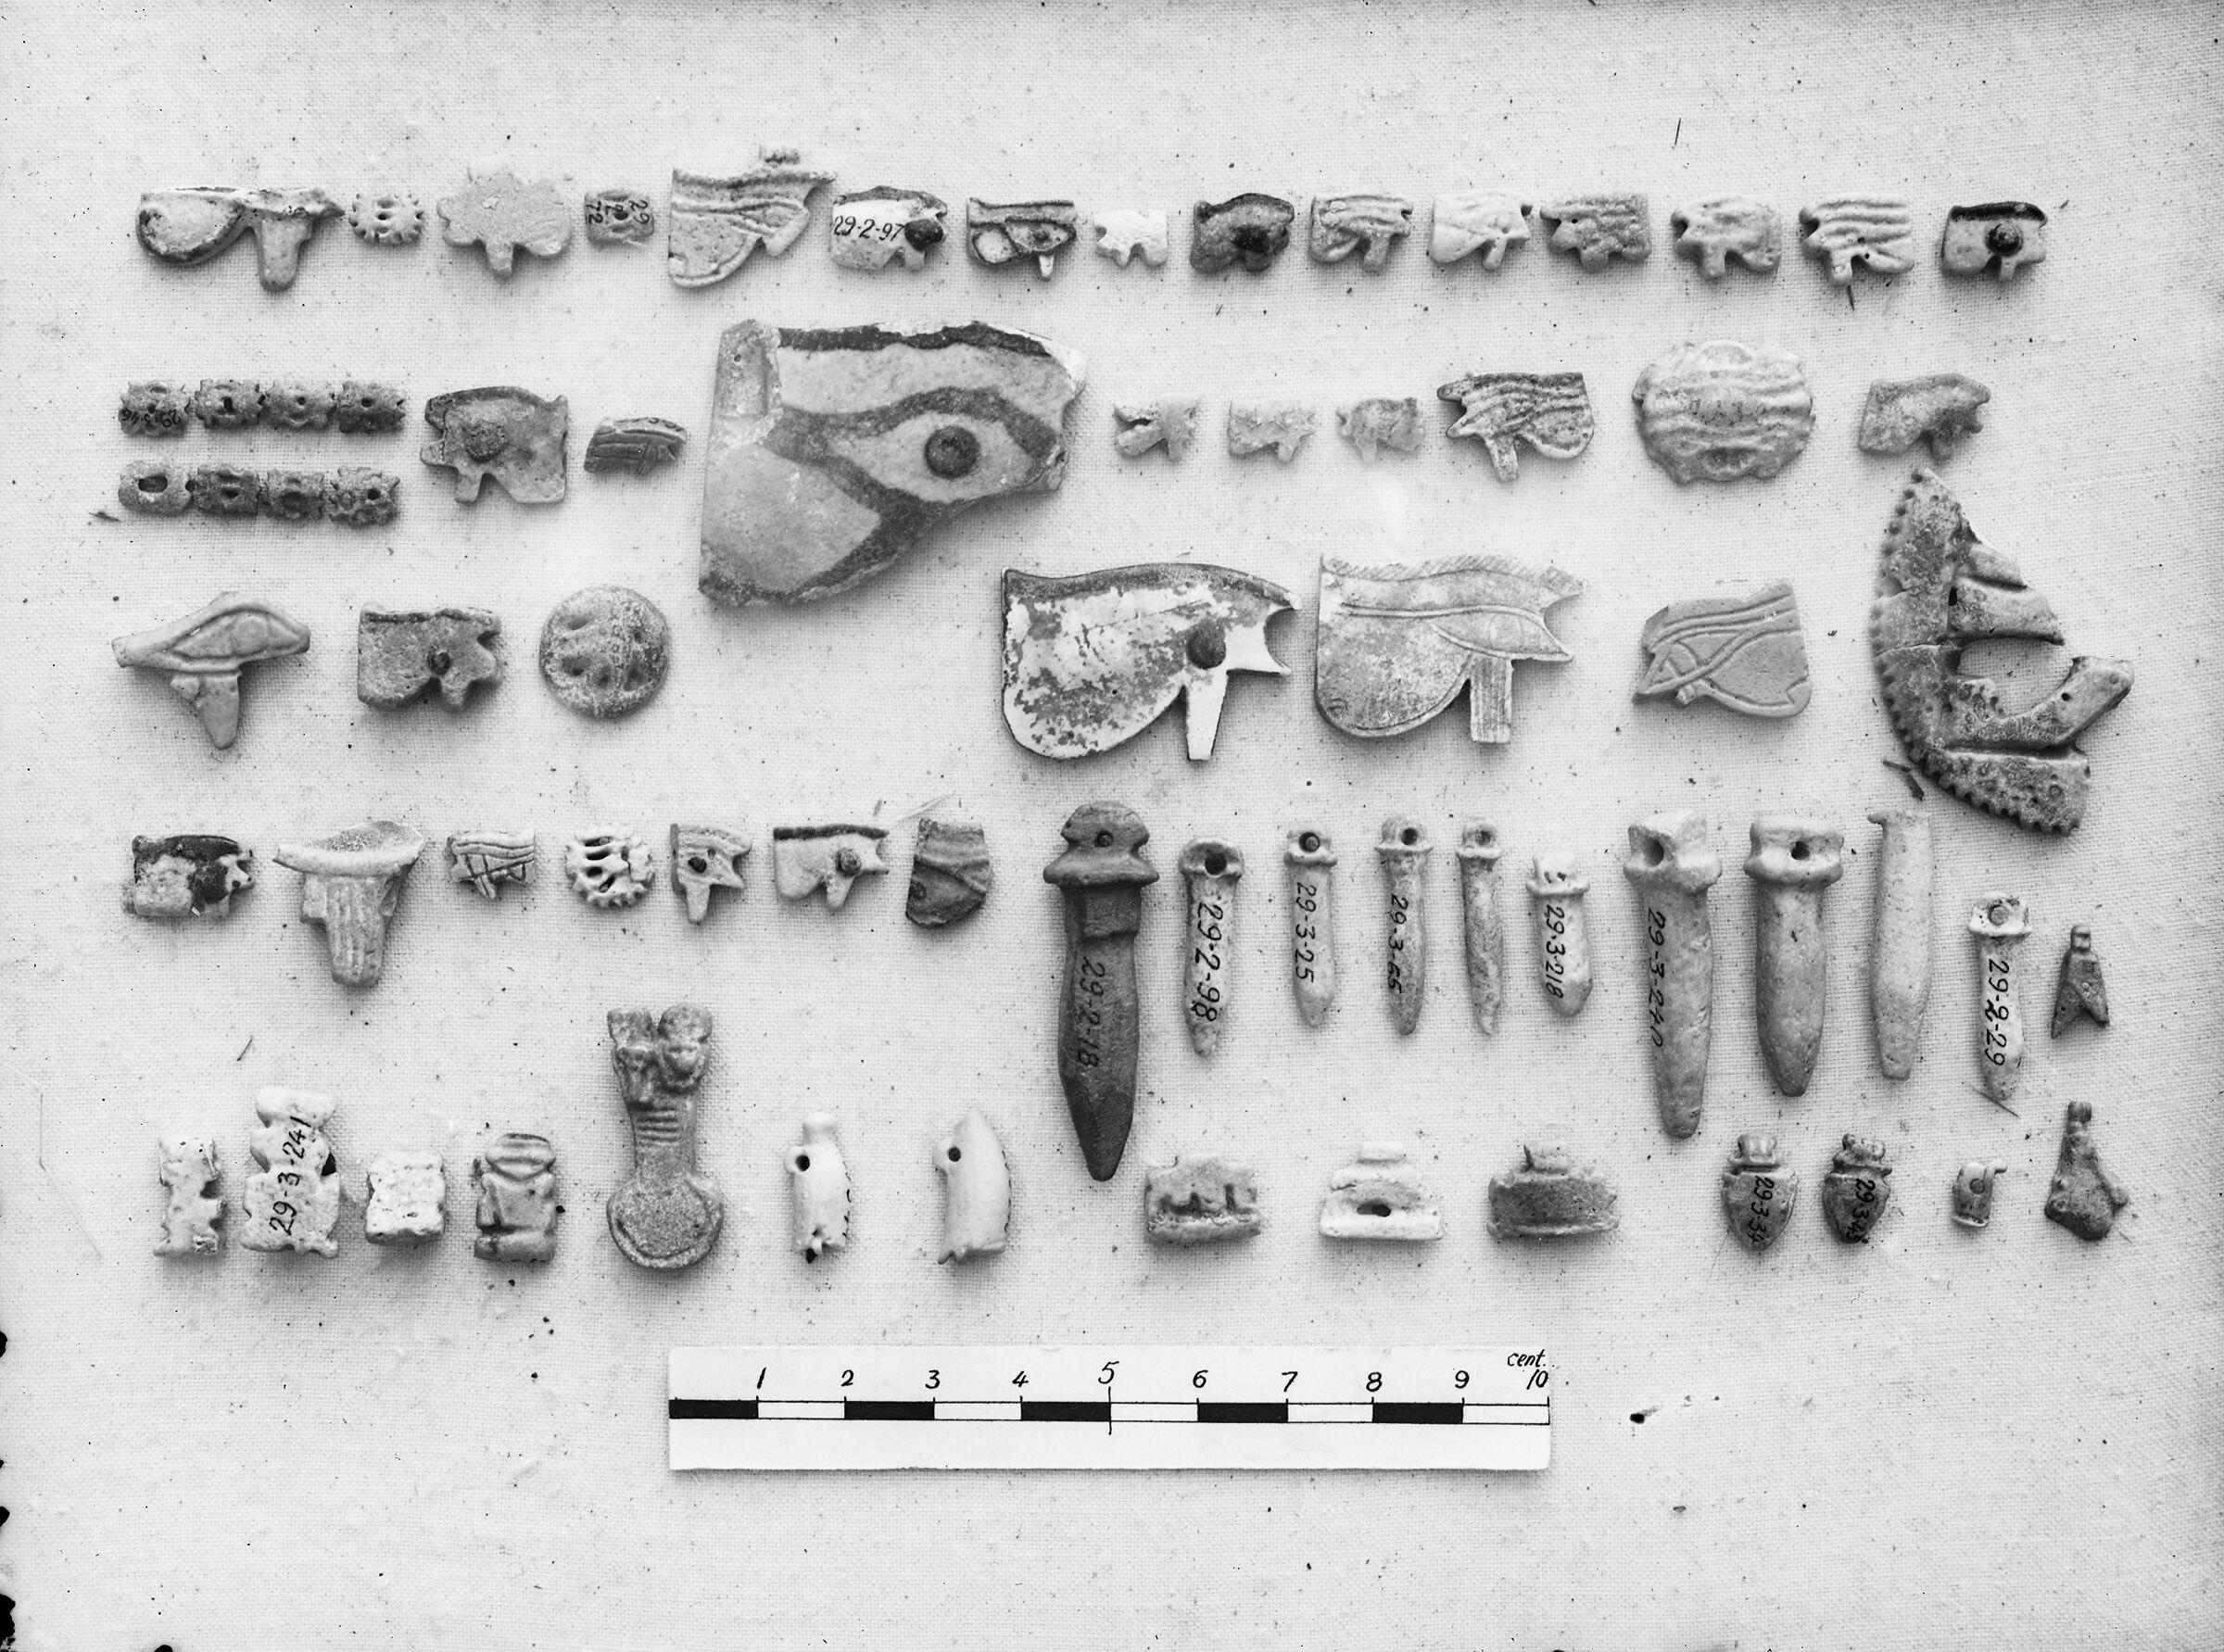 Object(s) photograph: Site: Giza; view: street G 7600, G 7670, G 7660, street G 7500, G 7690, G 7600 Pt XXVII, avenue G 2, G 7000 SE 74